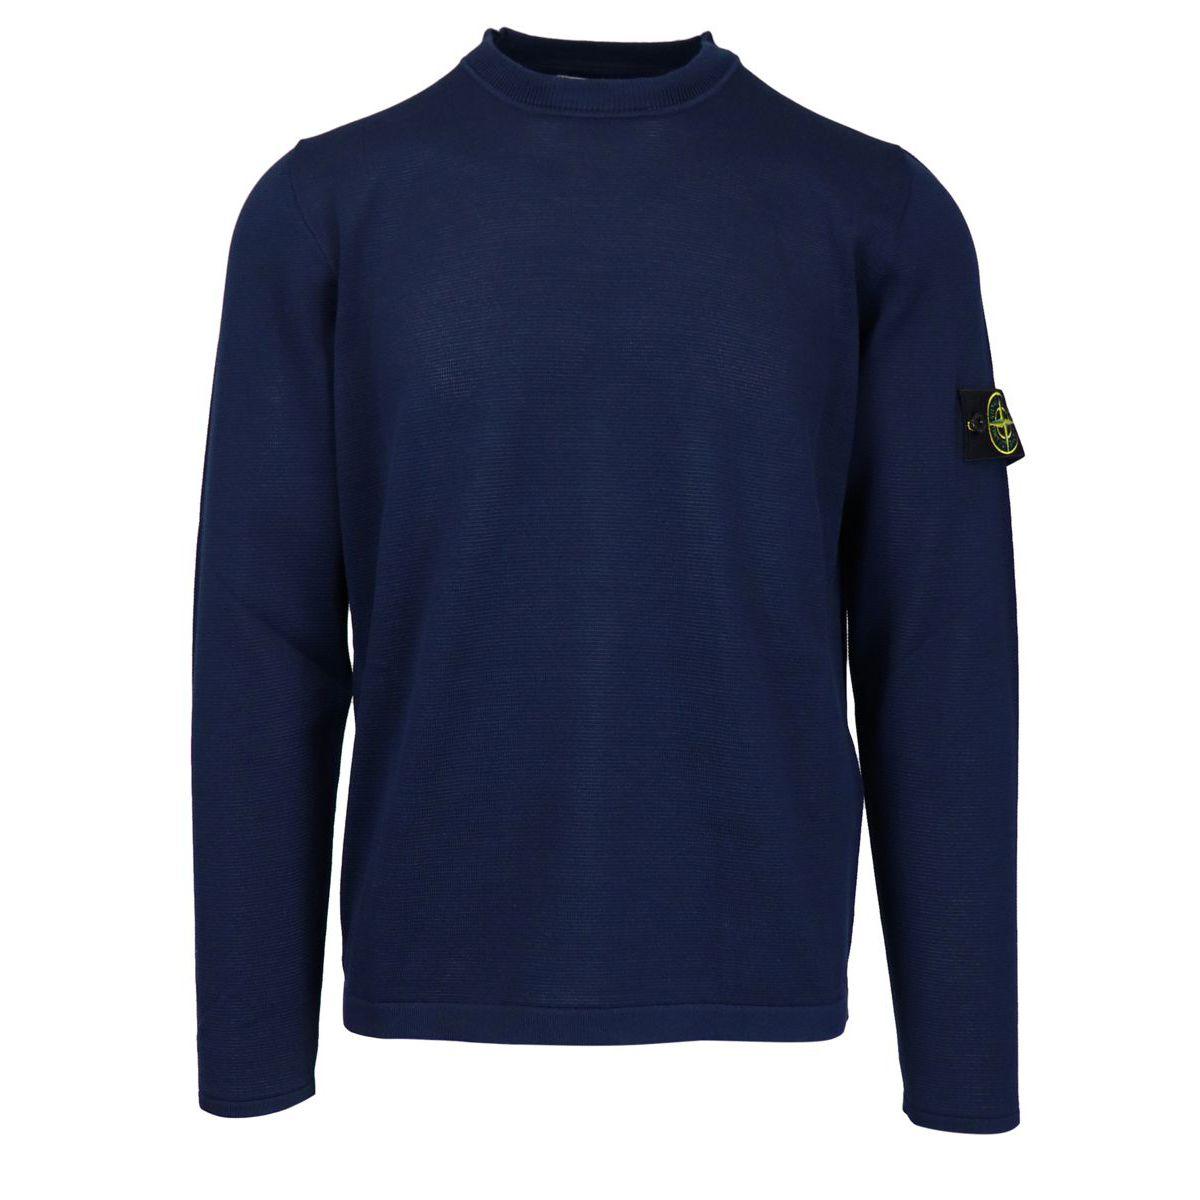 Crew neck cotton sweater with logo patch on sleeve Marine blue Stone Island